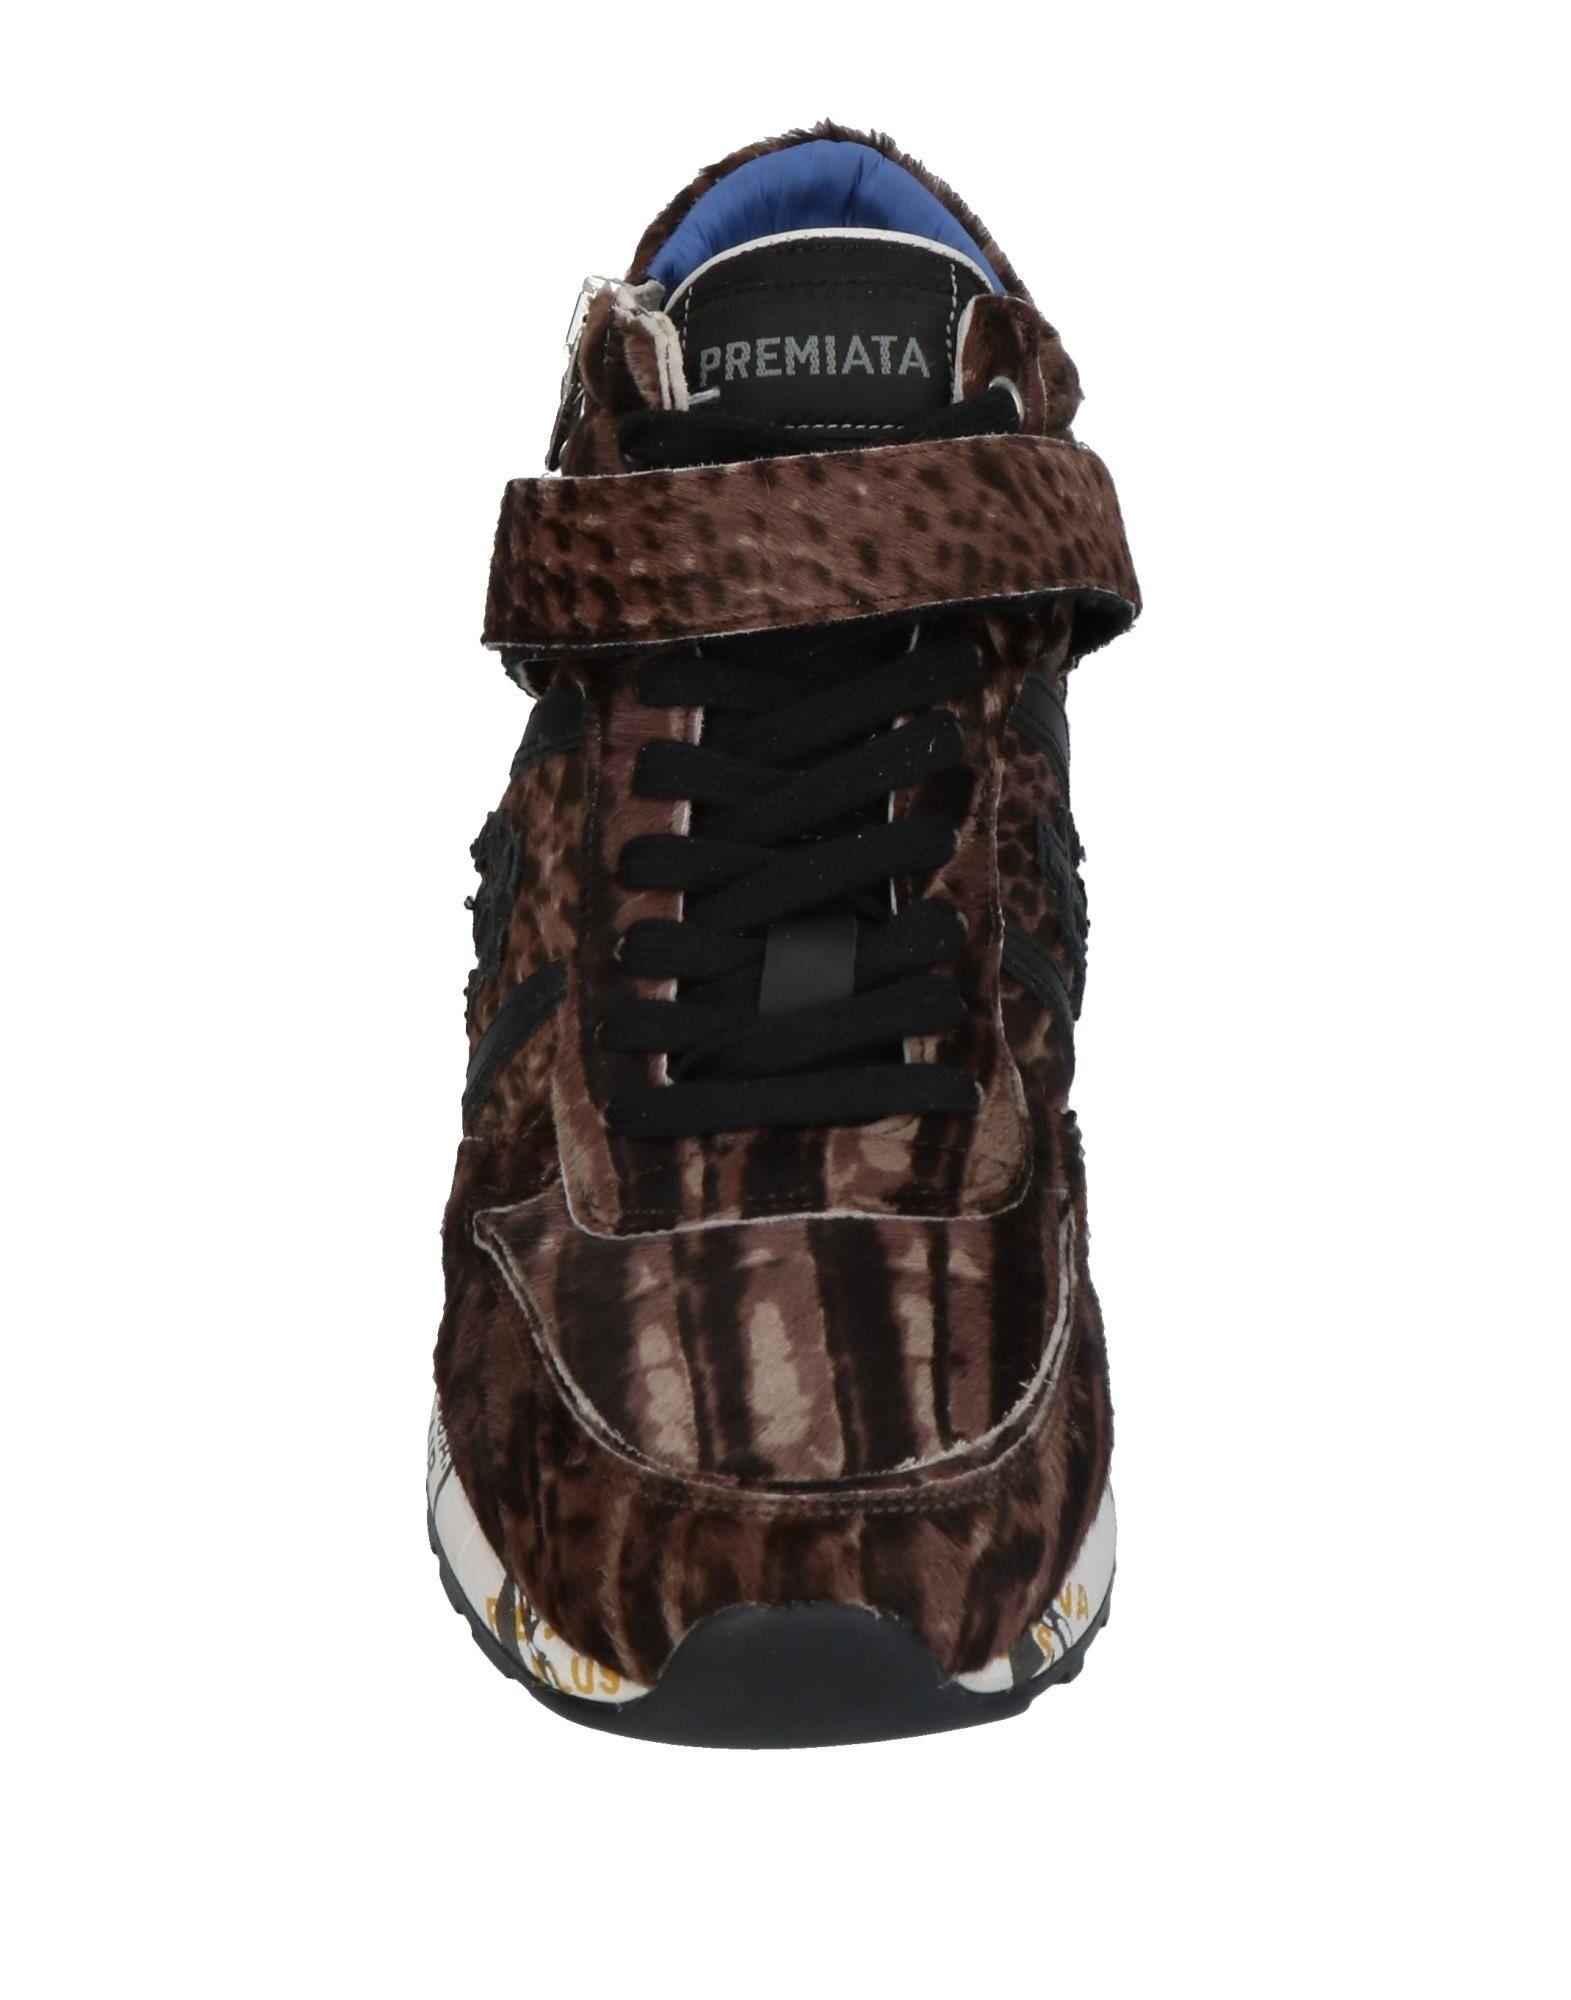 4d04b4f3ab6 PREMIATA ΠΑΠΟΥΤΣΙΑ Χαμηλά sneakers, Γυναικεία sneakers, ΓΥΝΑΙΚΑ | ΠΑΠΟΥΤΣΙΑ  | SNEAKERS